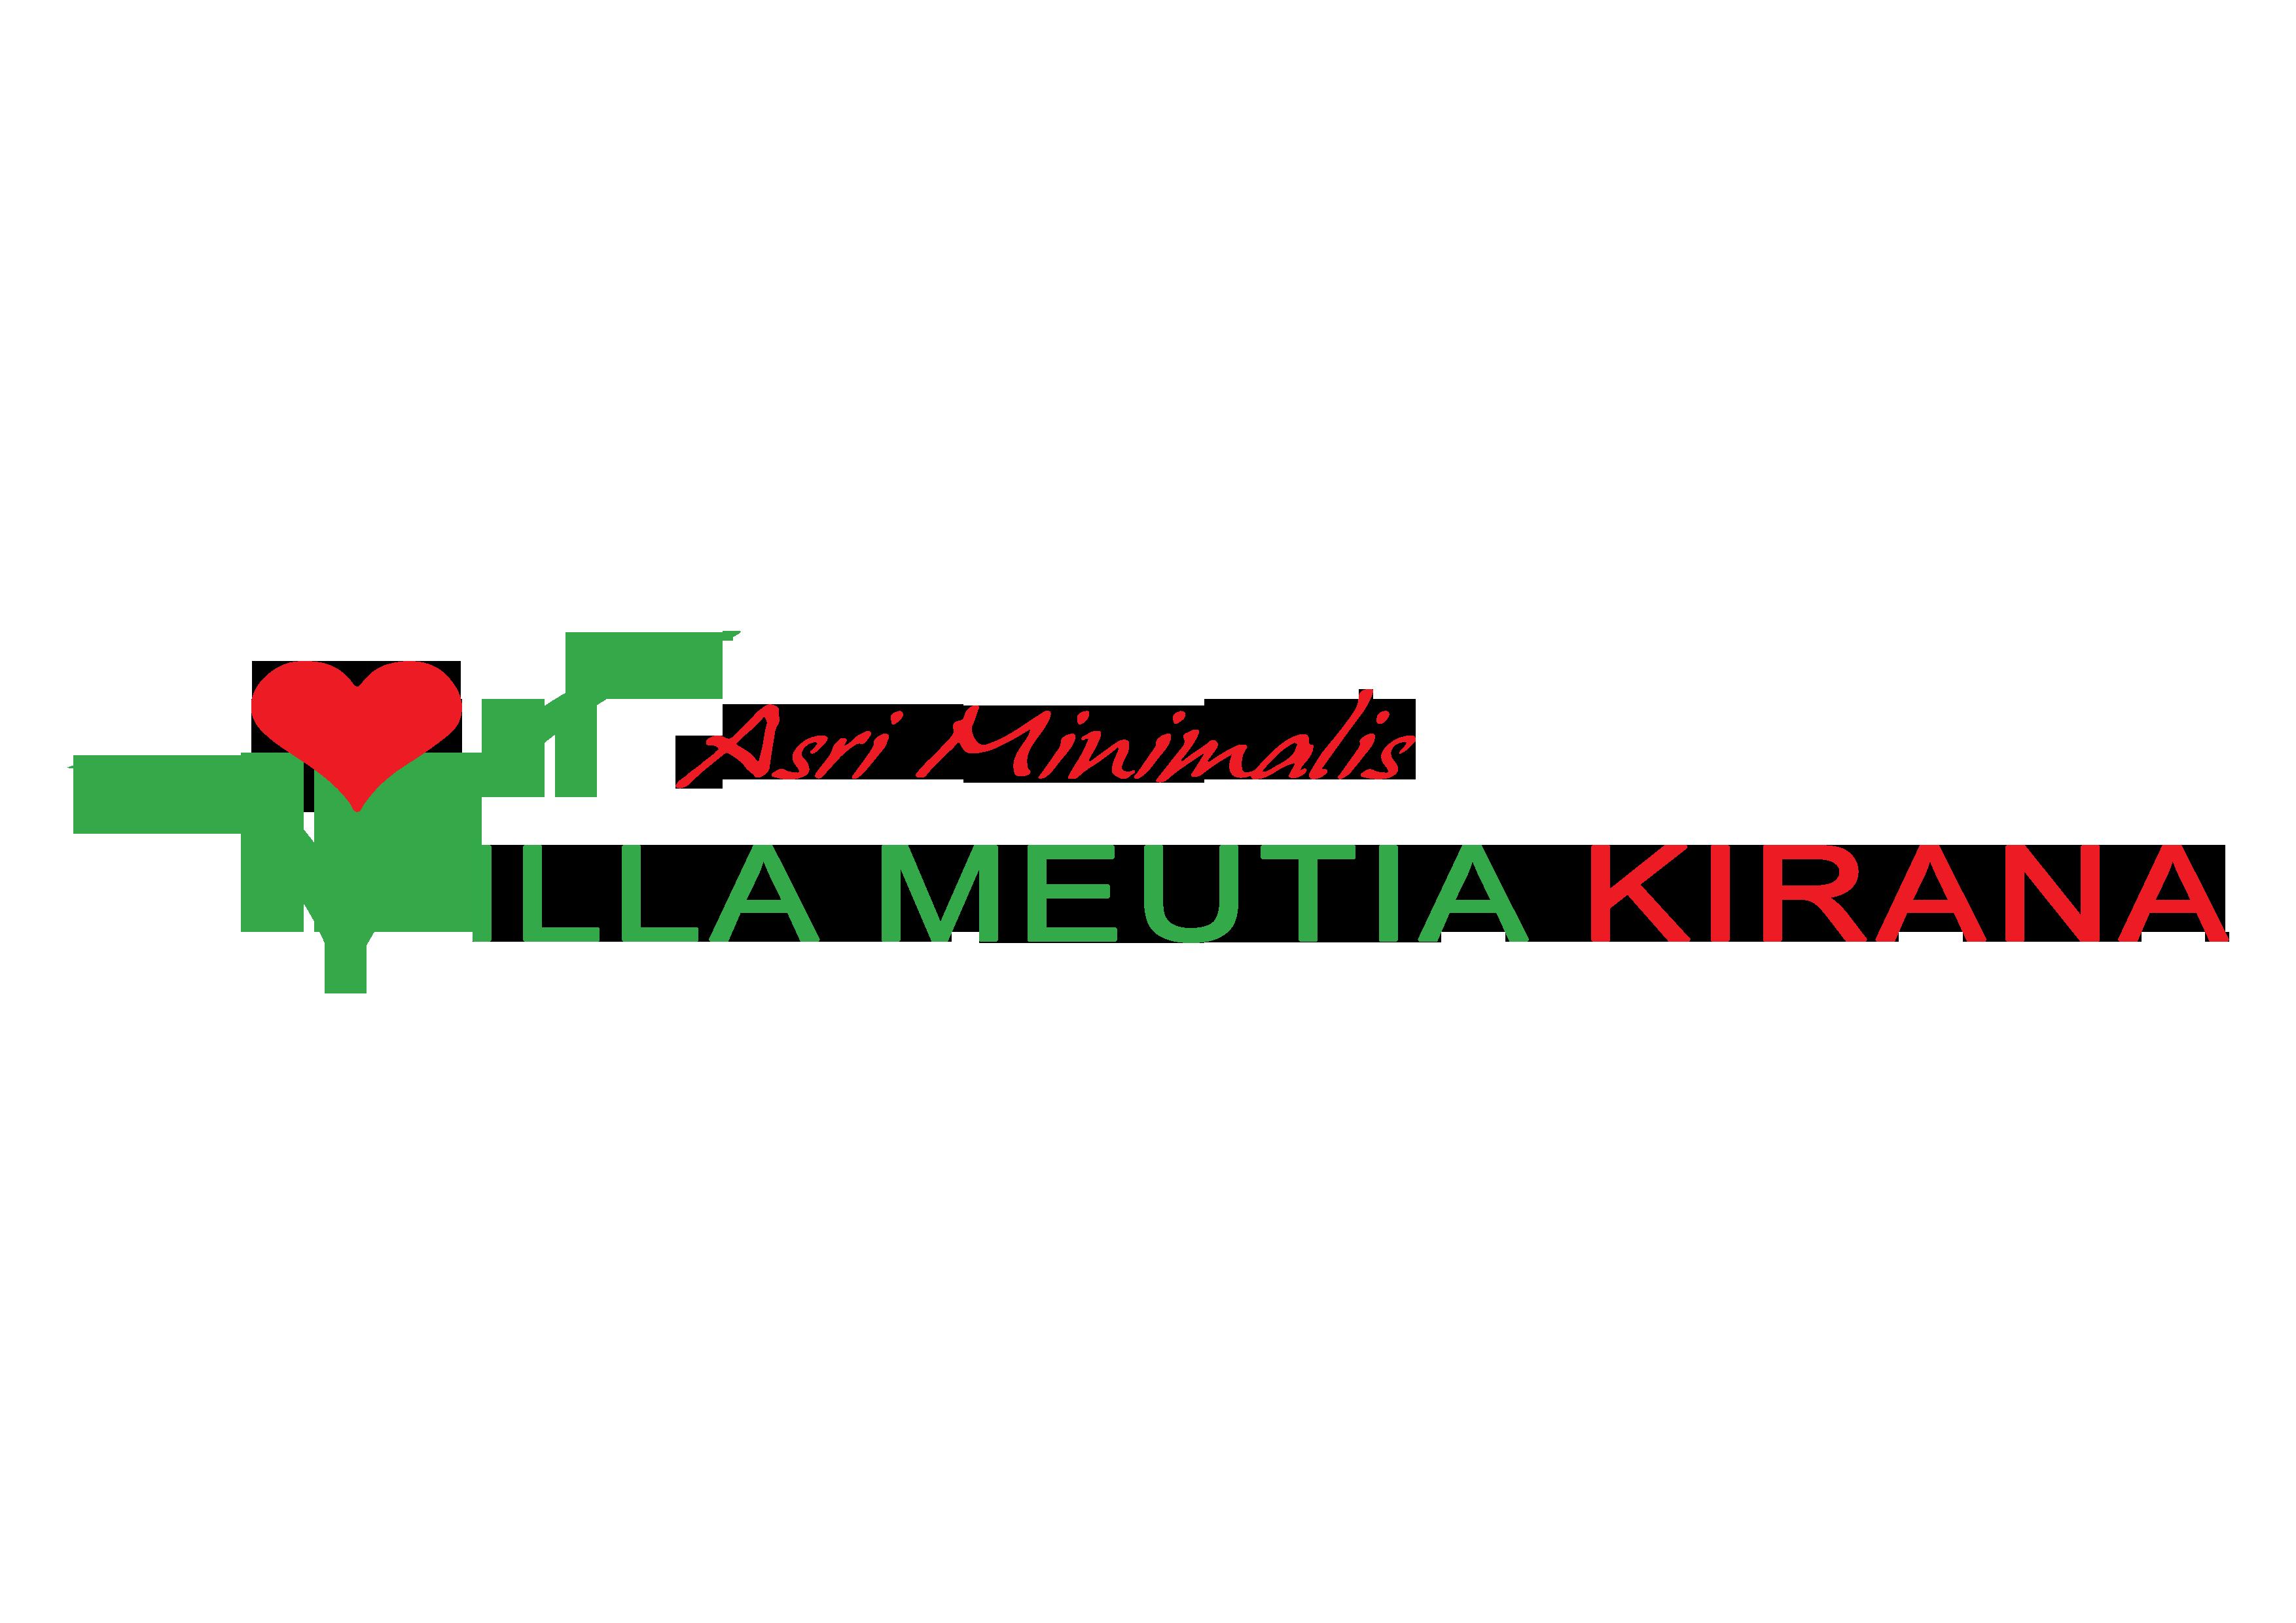 Villa Meutia Kirana